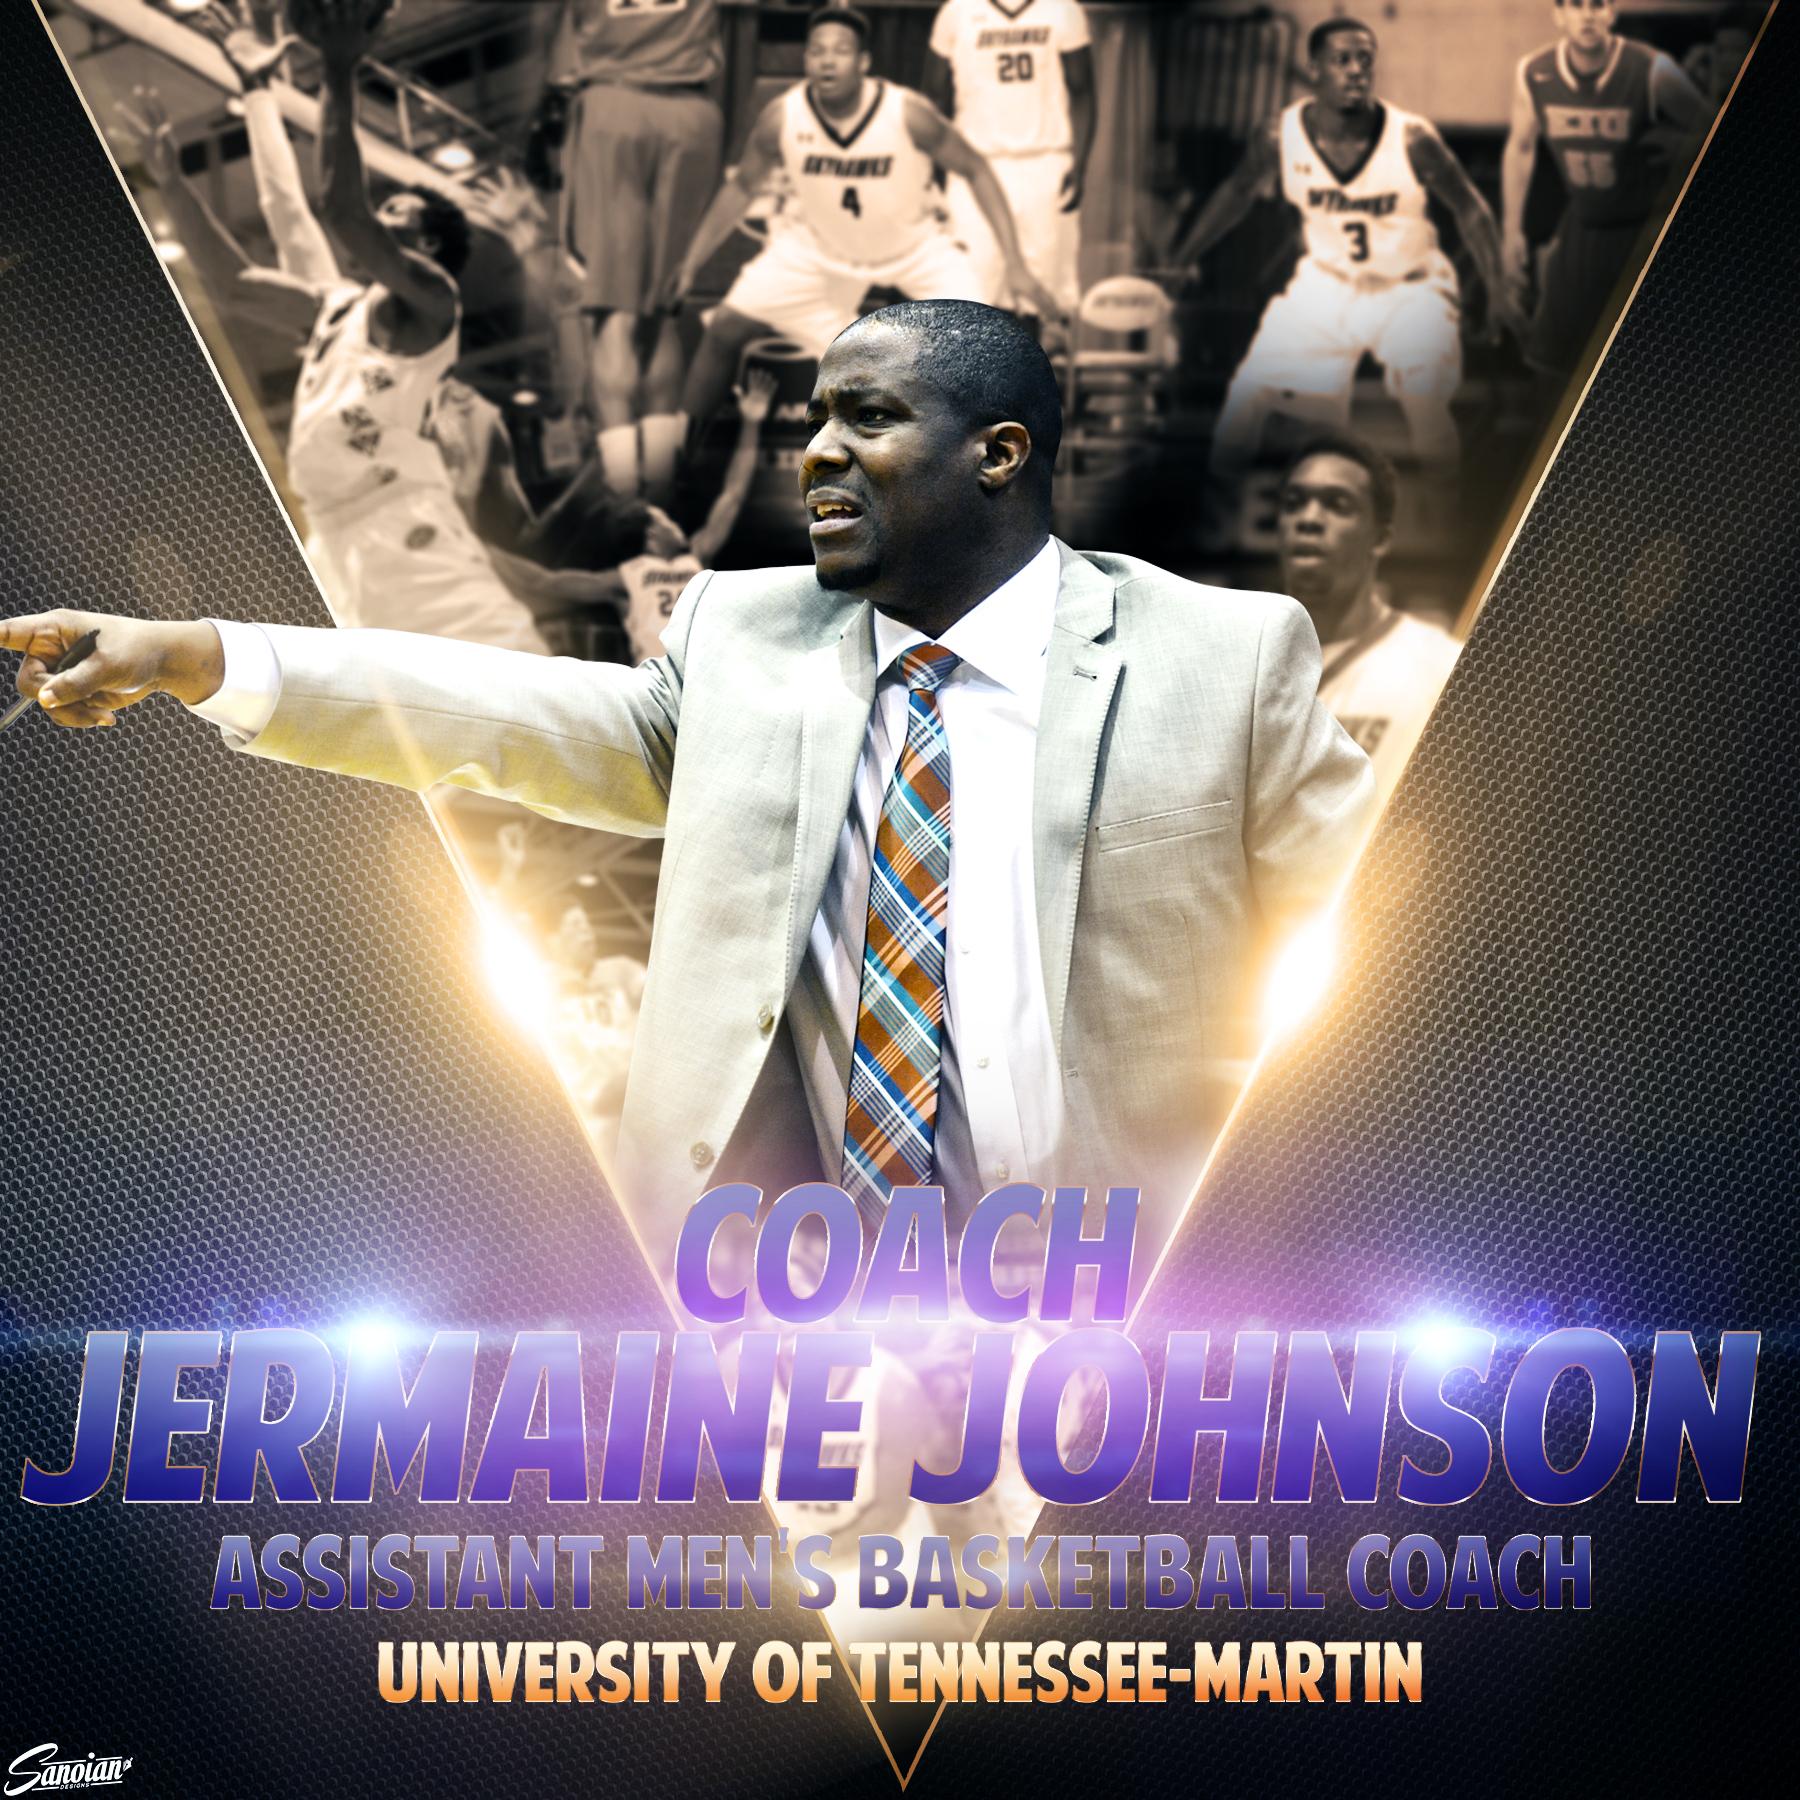 CoachJohnson.jpg